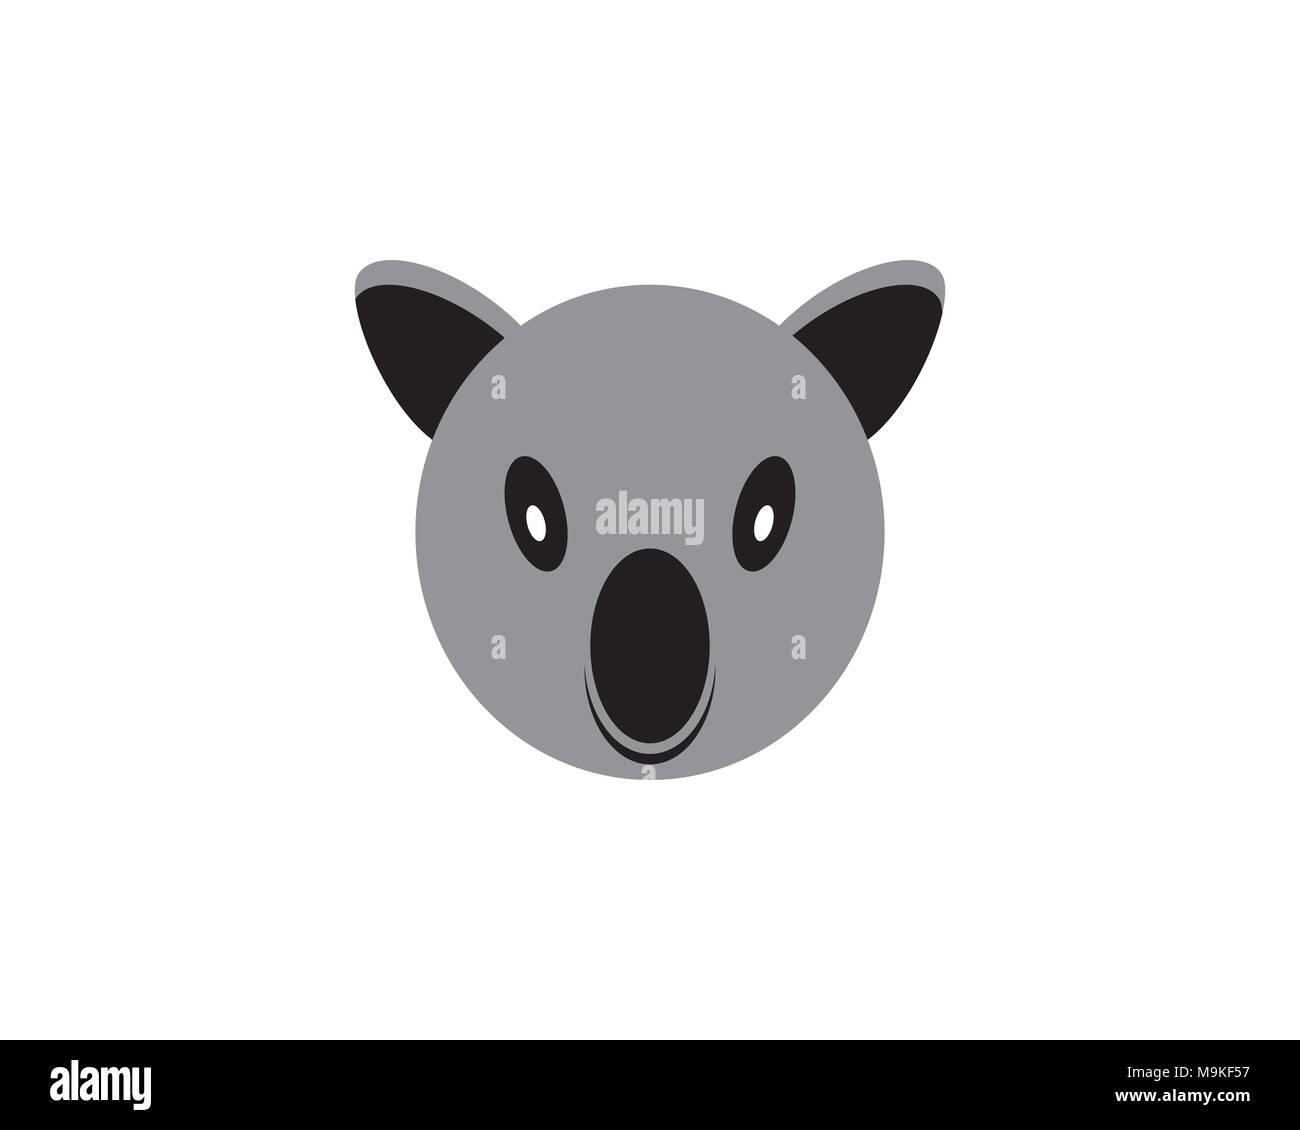 Baby Koala Cartoon Head Imágenes De Stock & Baby Koala Cartoon Head ...